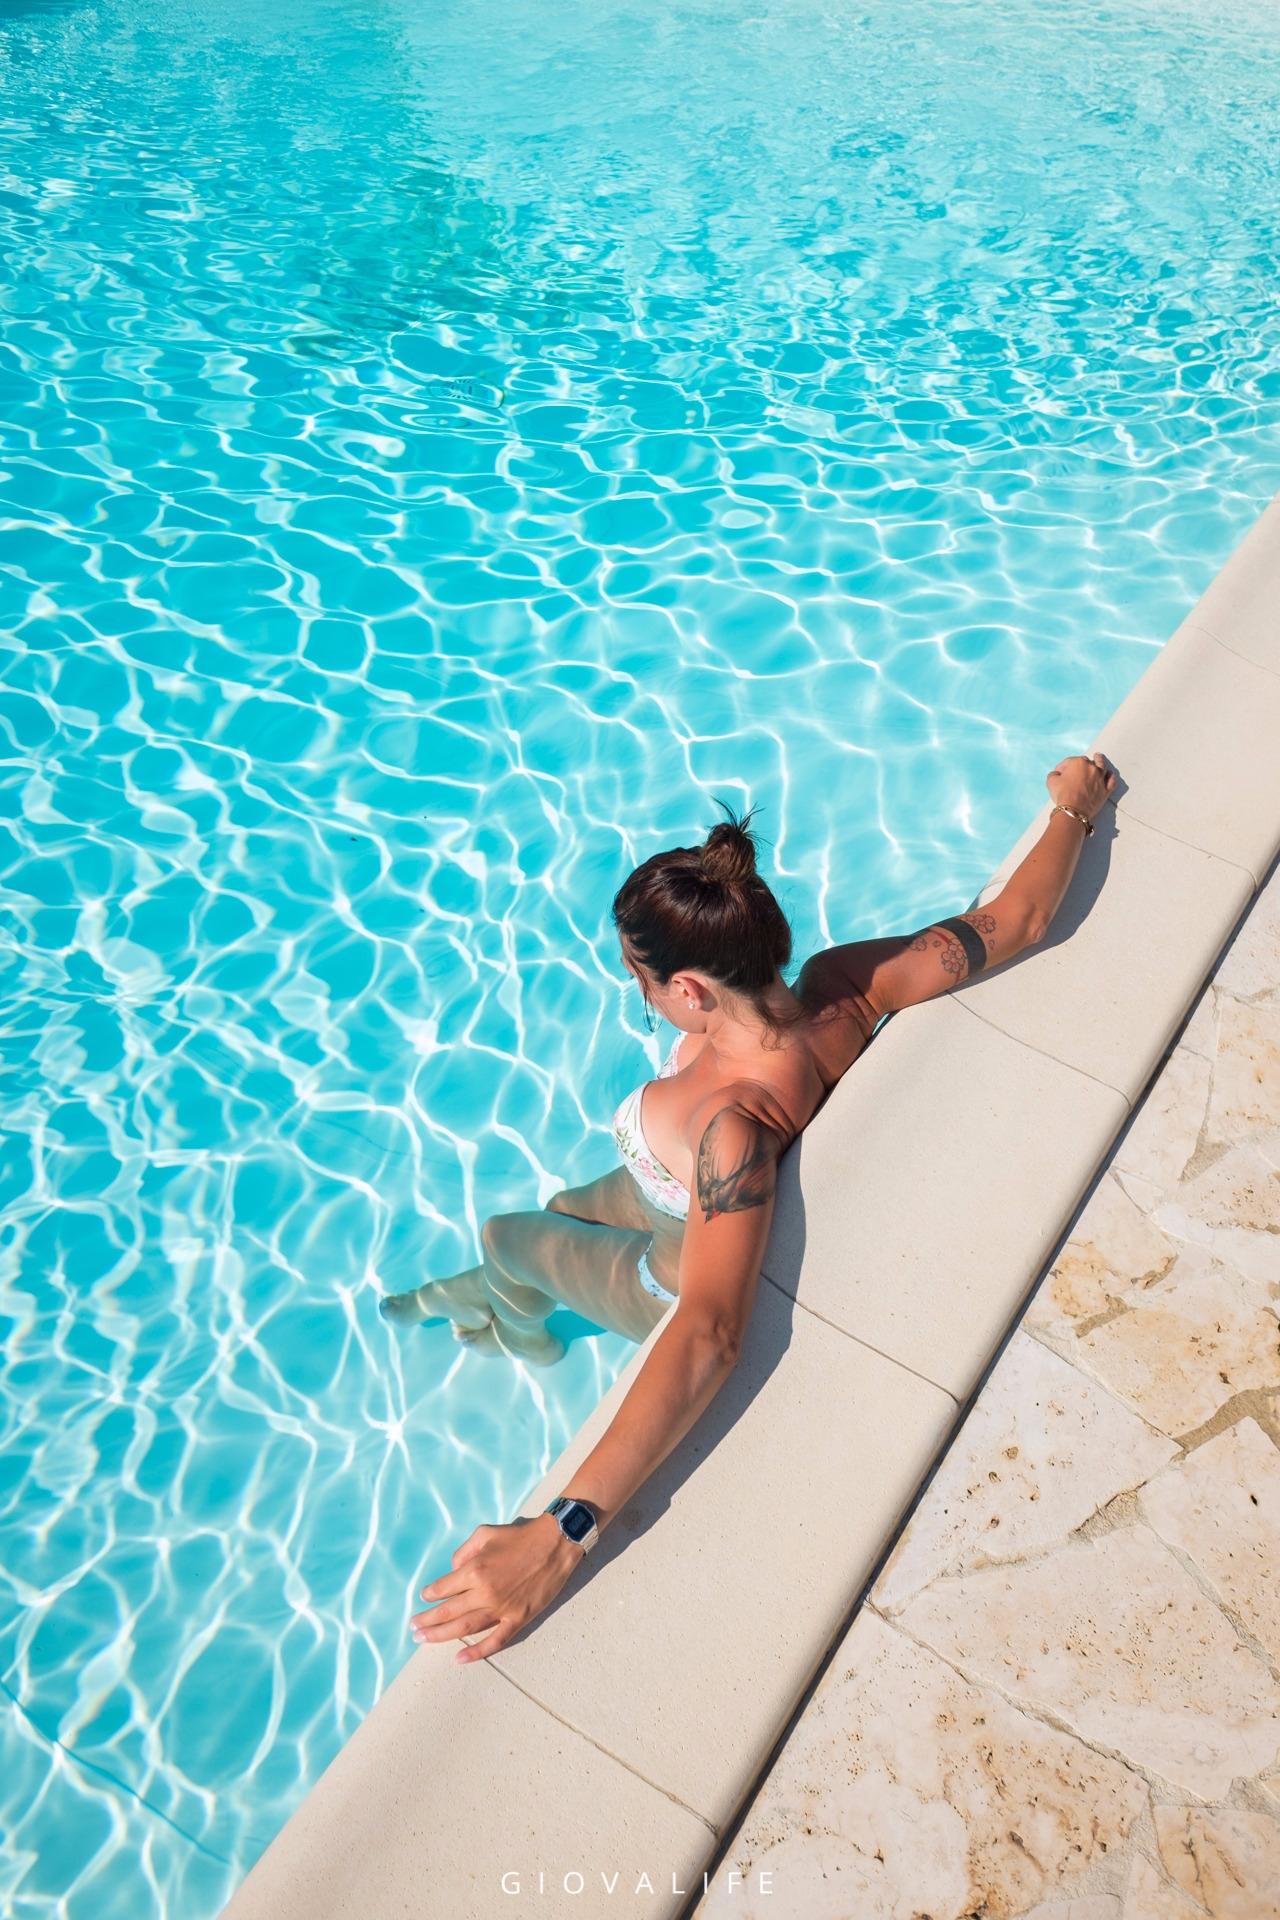 Ang Swimming pool Model: Angela - giovalife | ello